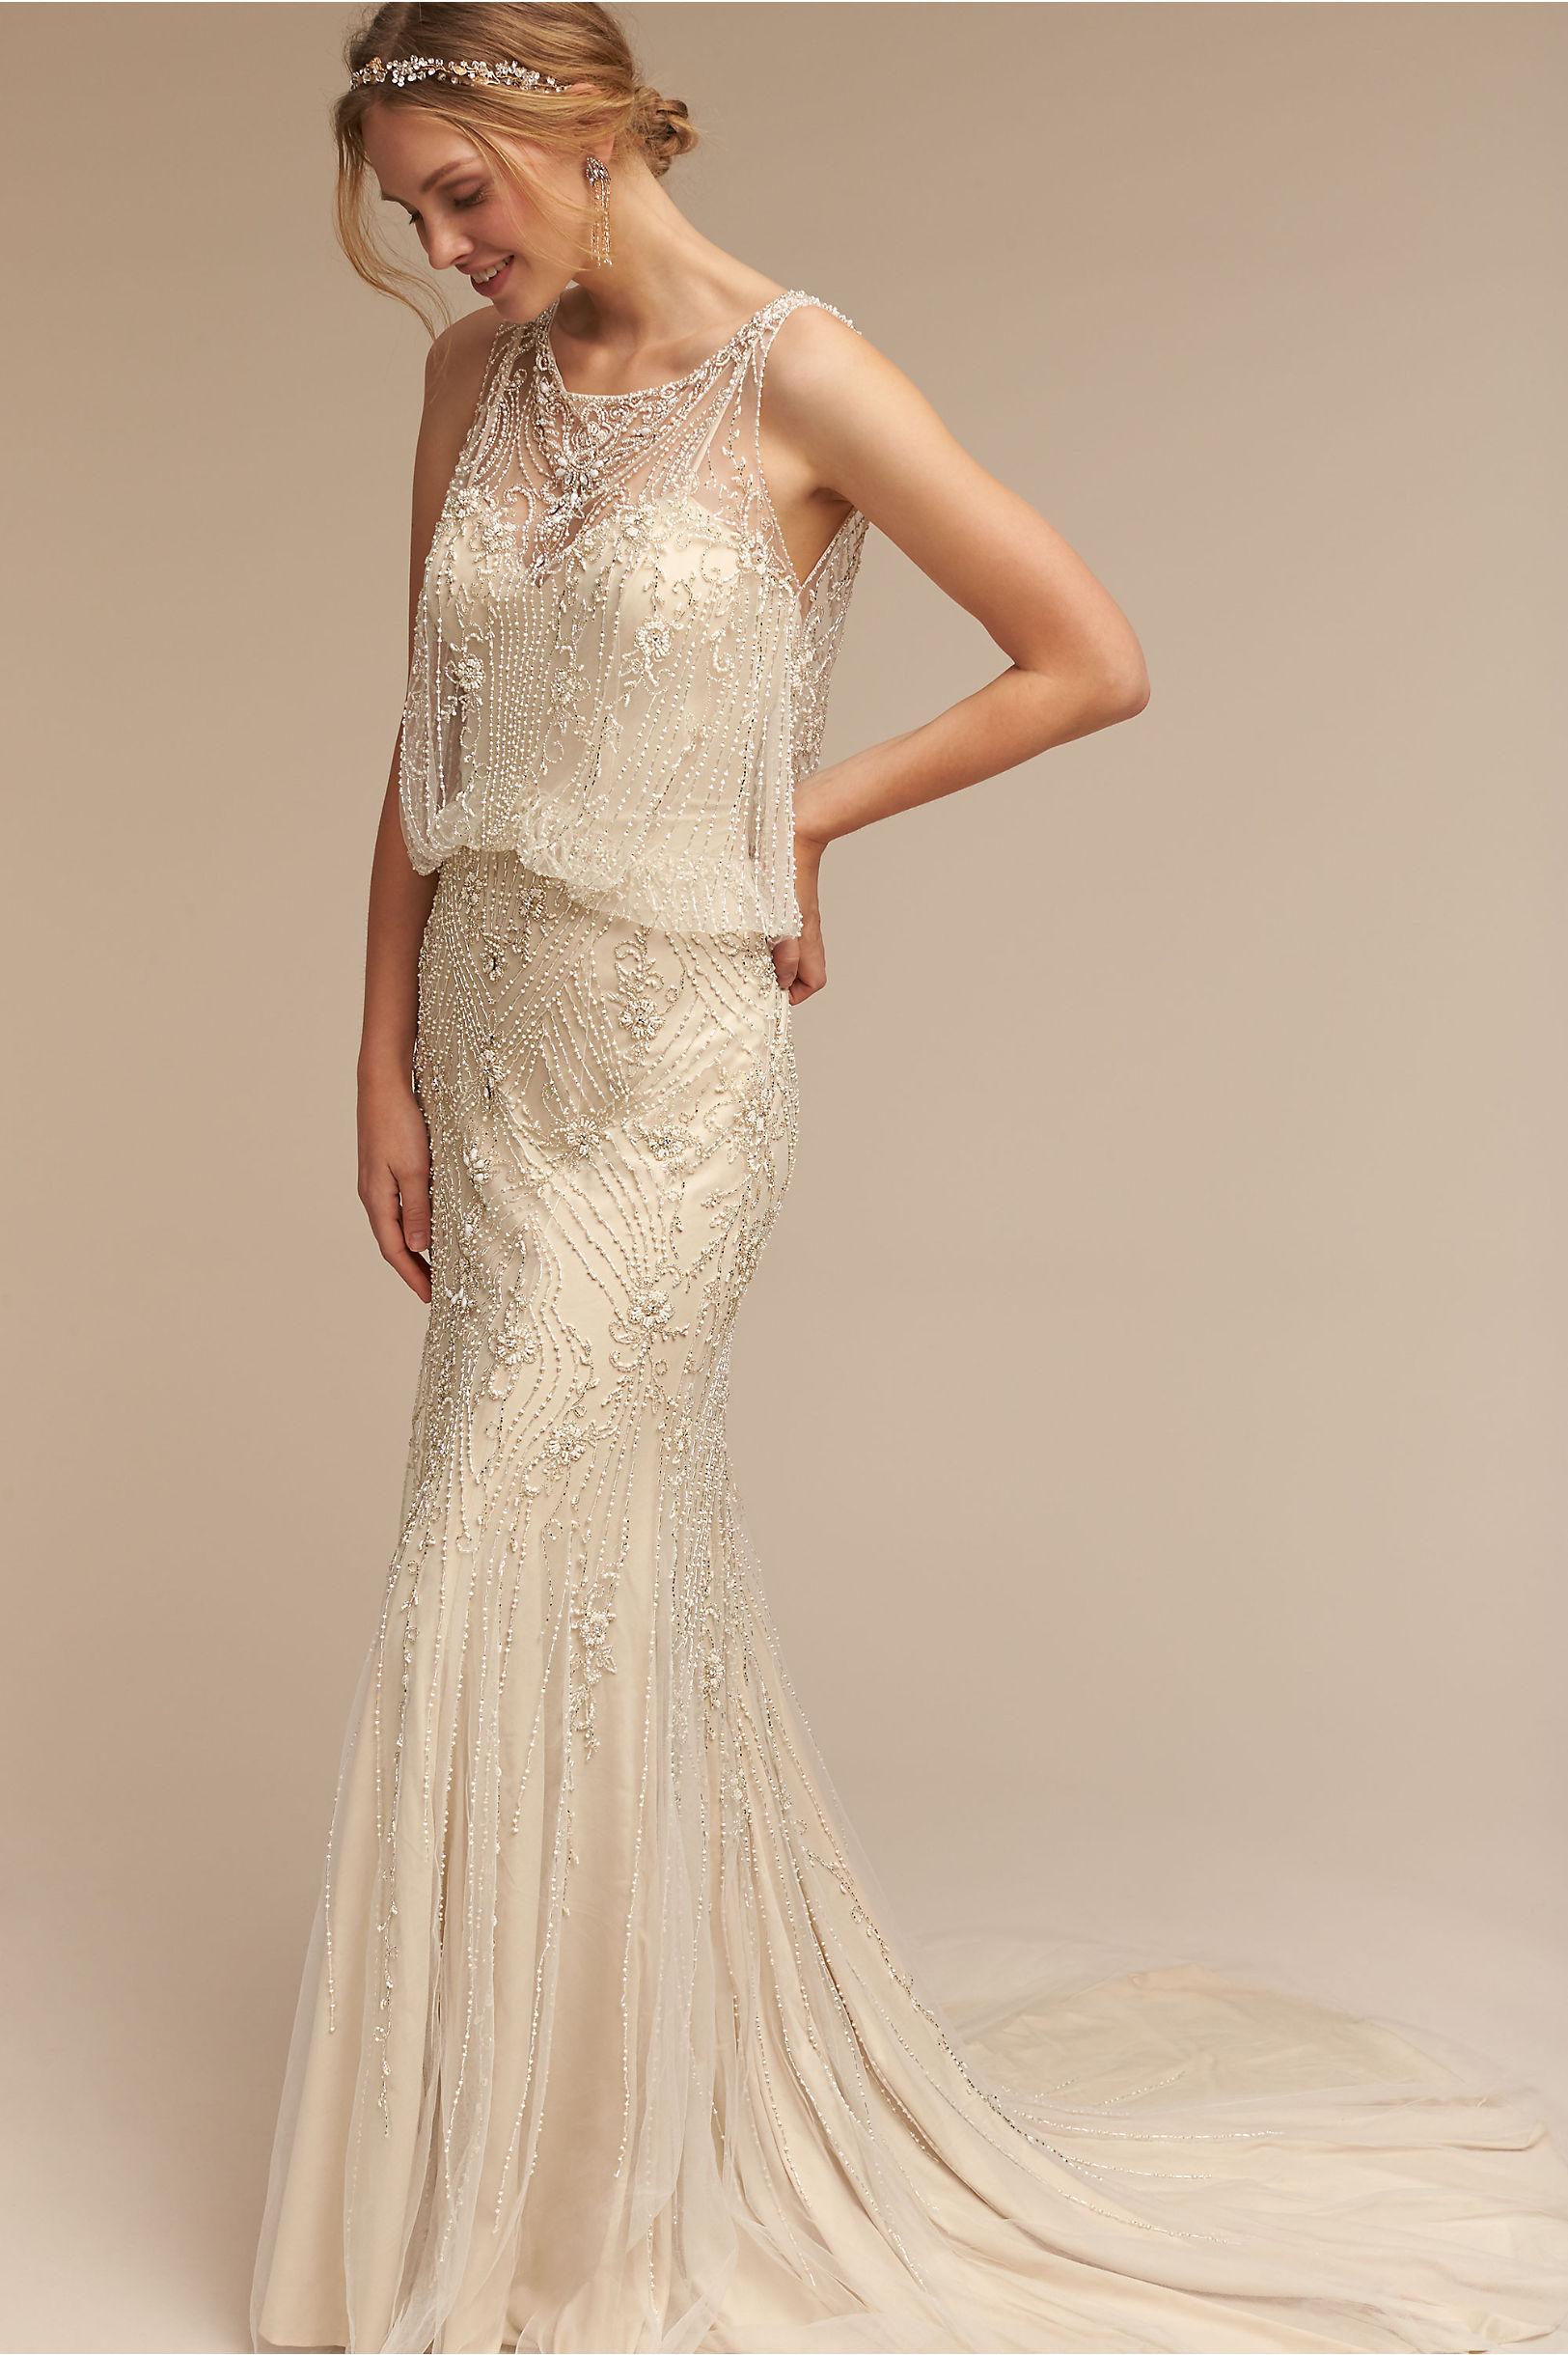 Wedding Dress with Long Train